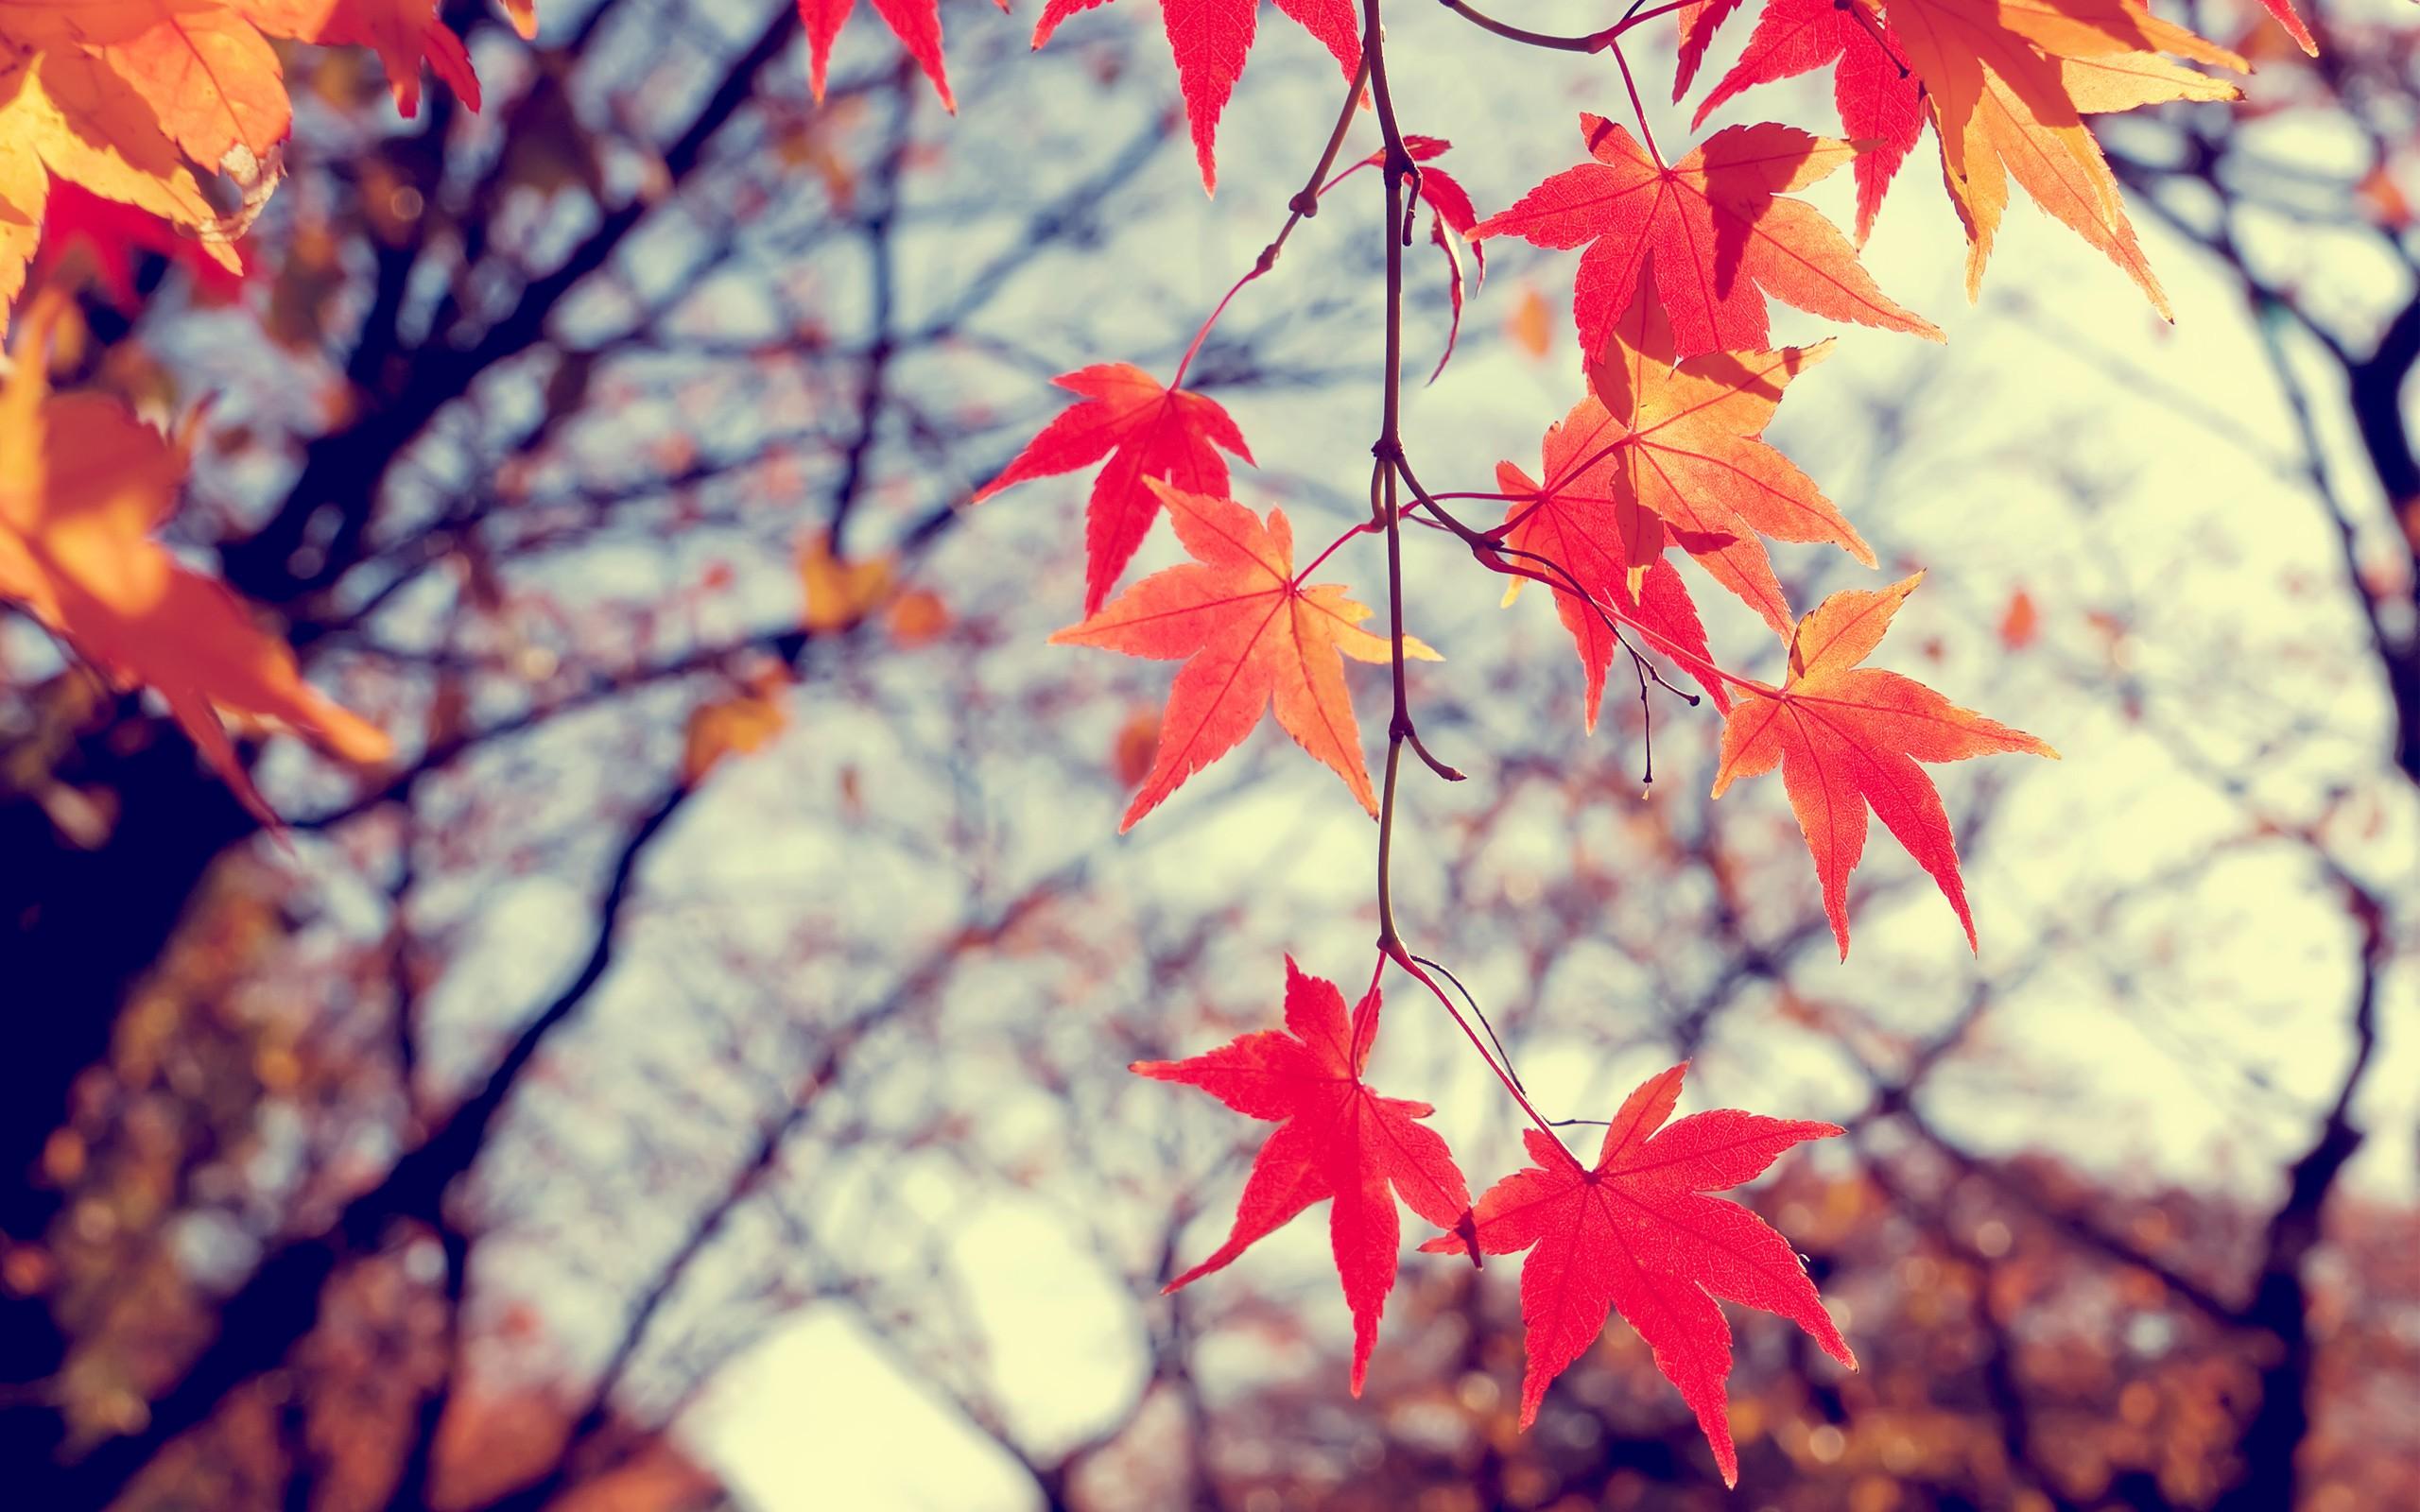 Wallpaper Sunlight Leaves Nature Red Branch Blossom